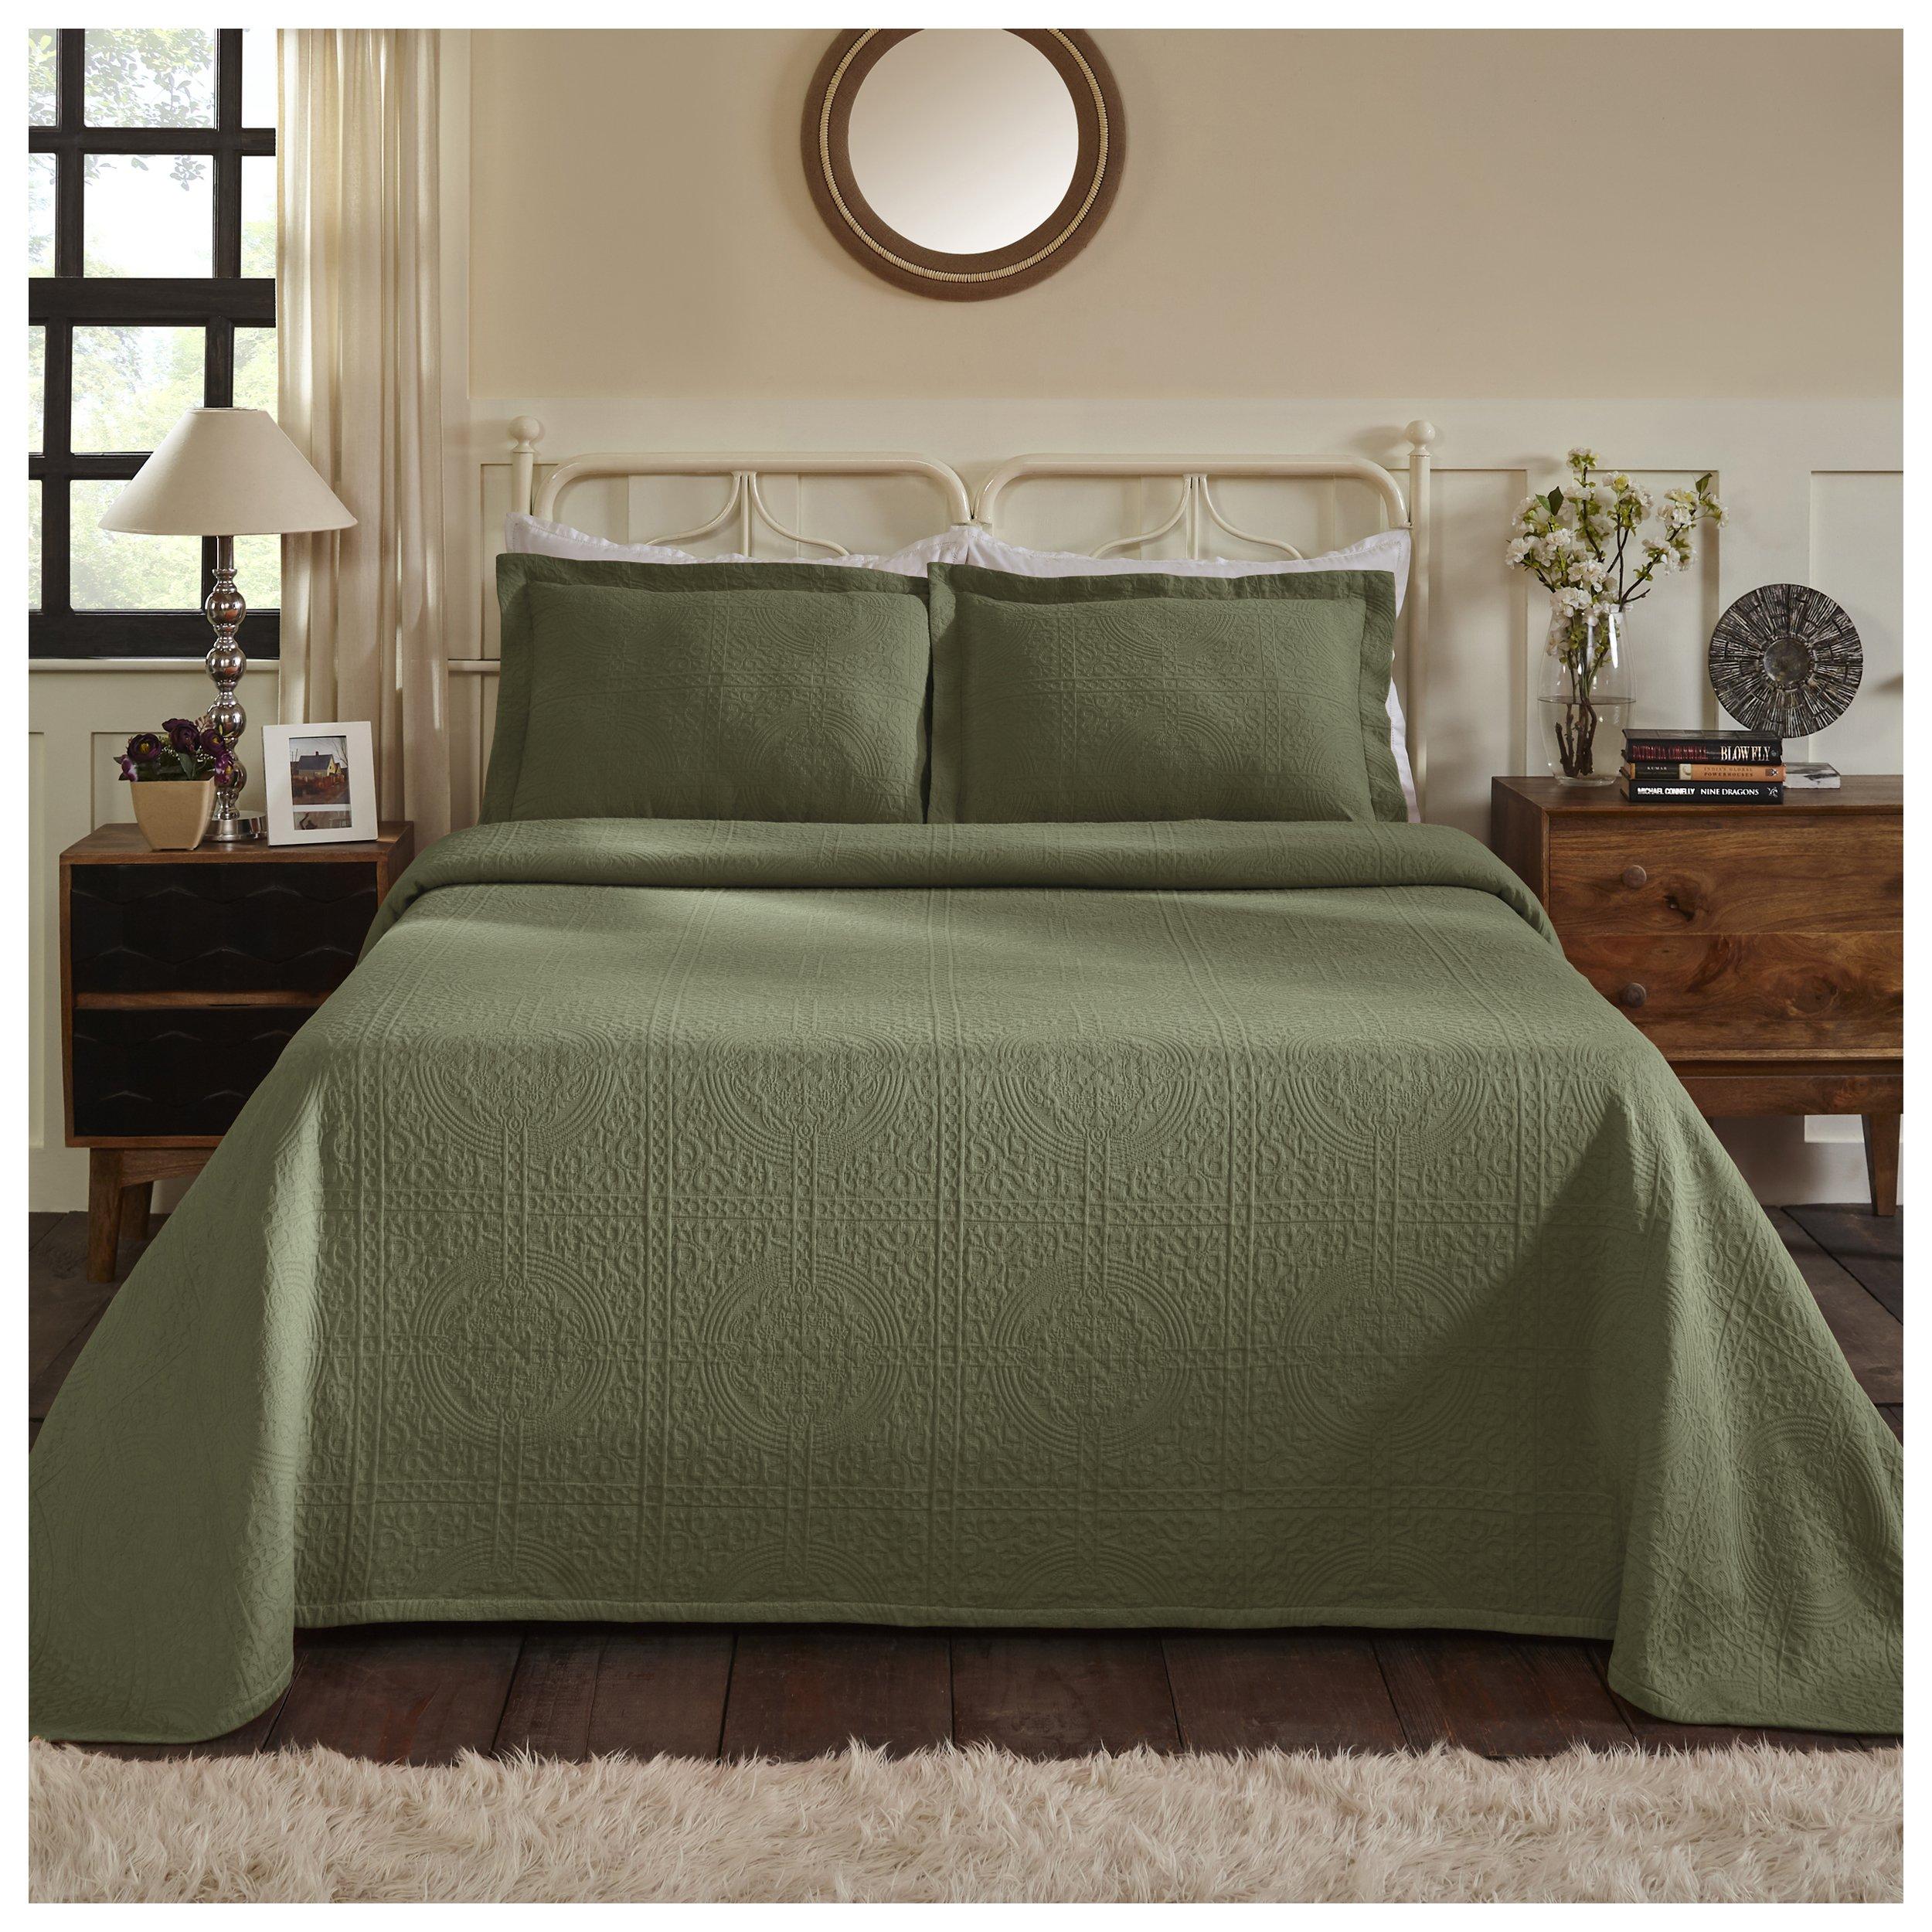 Superior 100% Cotton Medallion Bedspread with Shams, All-Season Premium Cotton Matelassé Jacquard Bedding, Quilted-look Floral Medallion Pattern - King, Sage